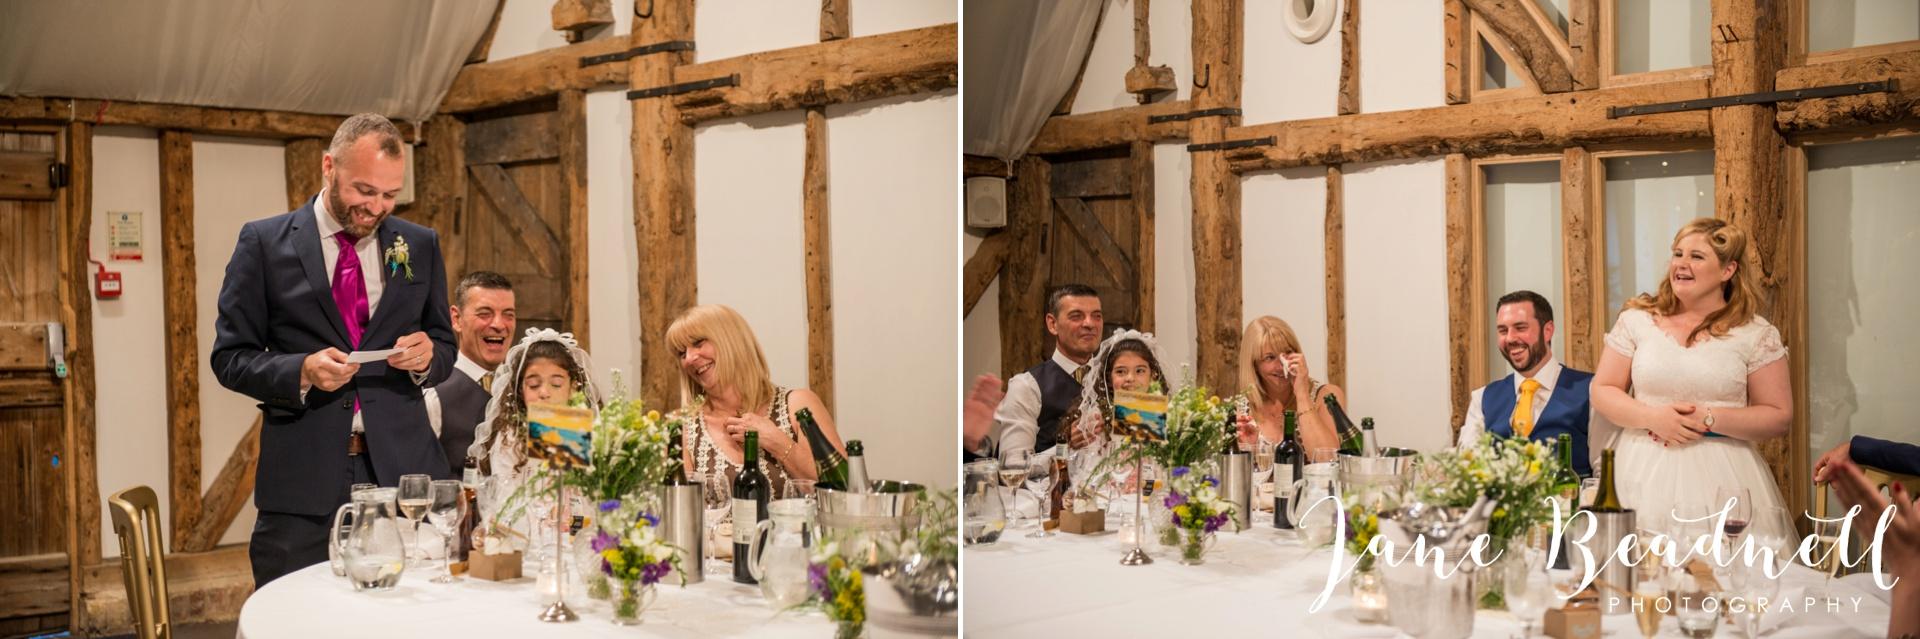 South Farm Wedding photography Hertfordshire by Jane Beadnell Photography fine art wedding photographer_0209